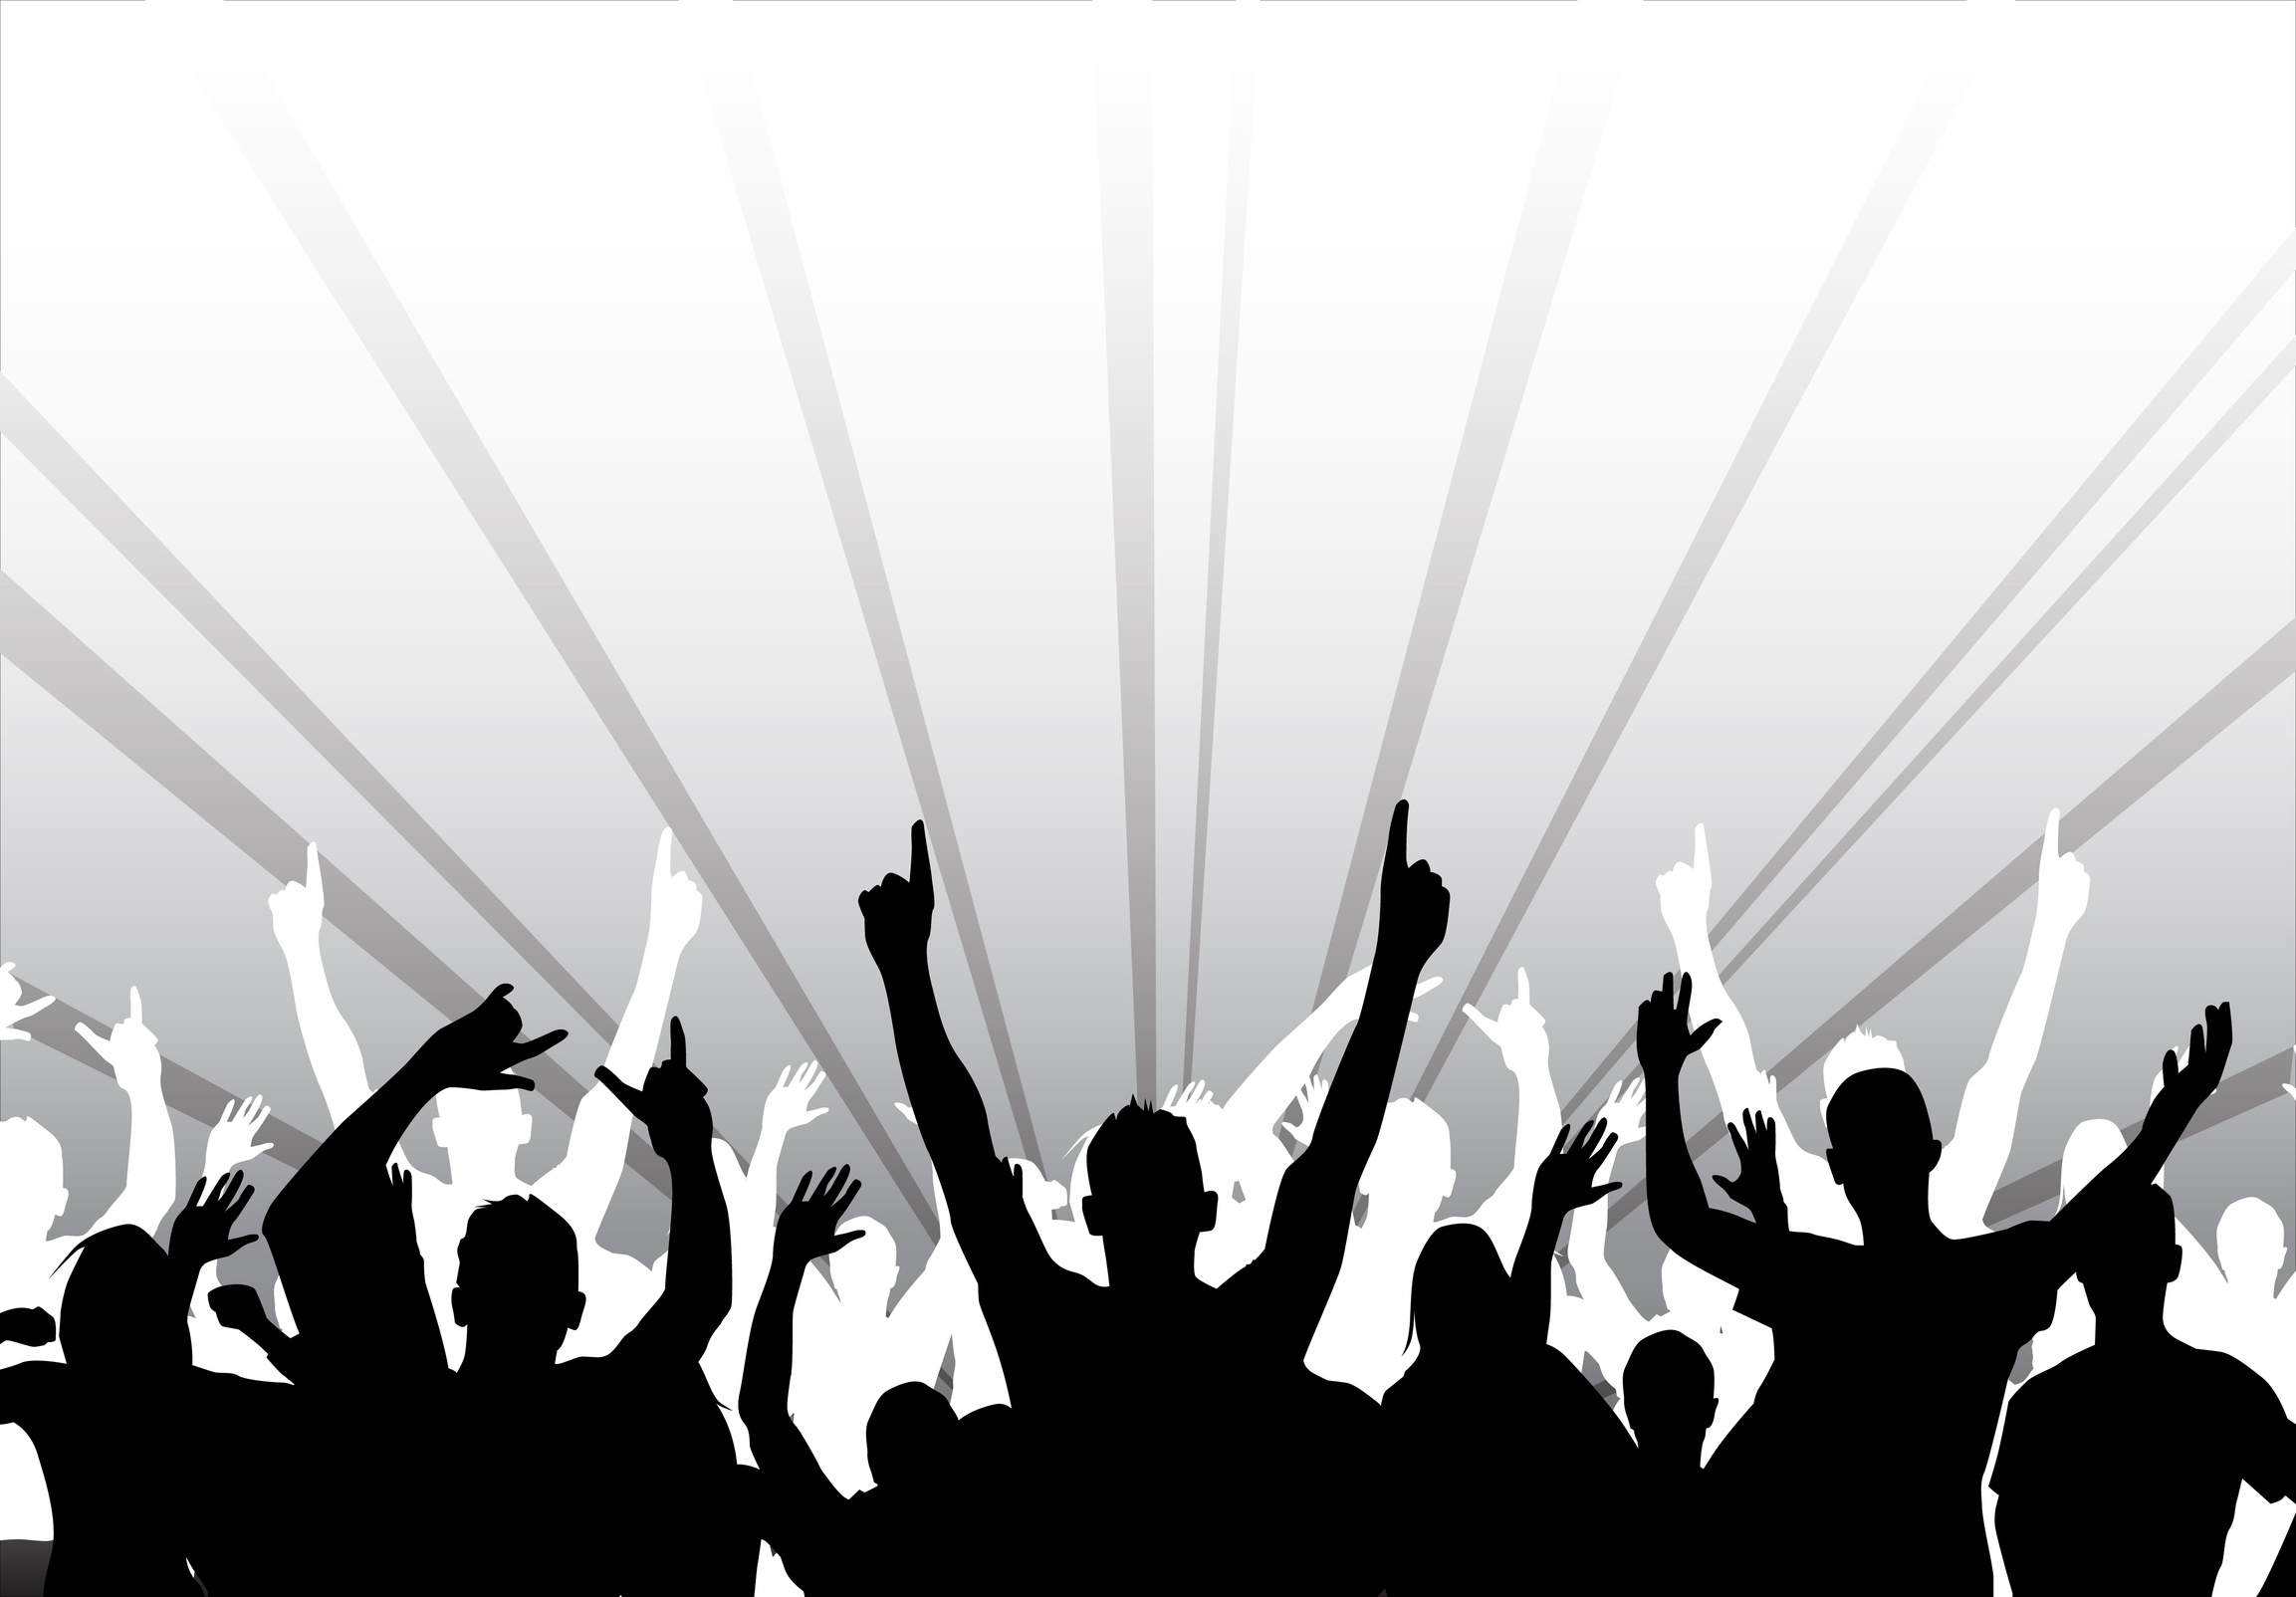 Concert crowd clip art clipart download